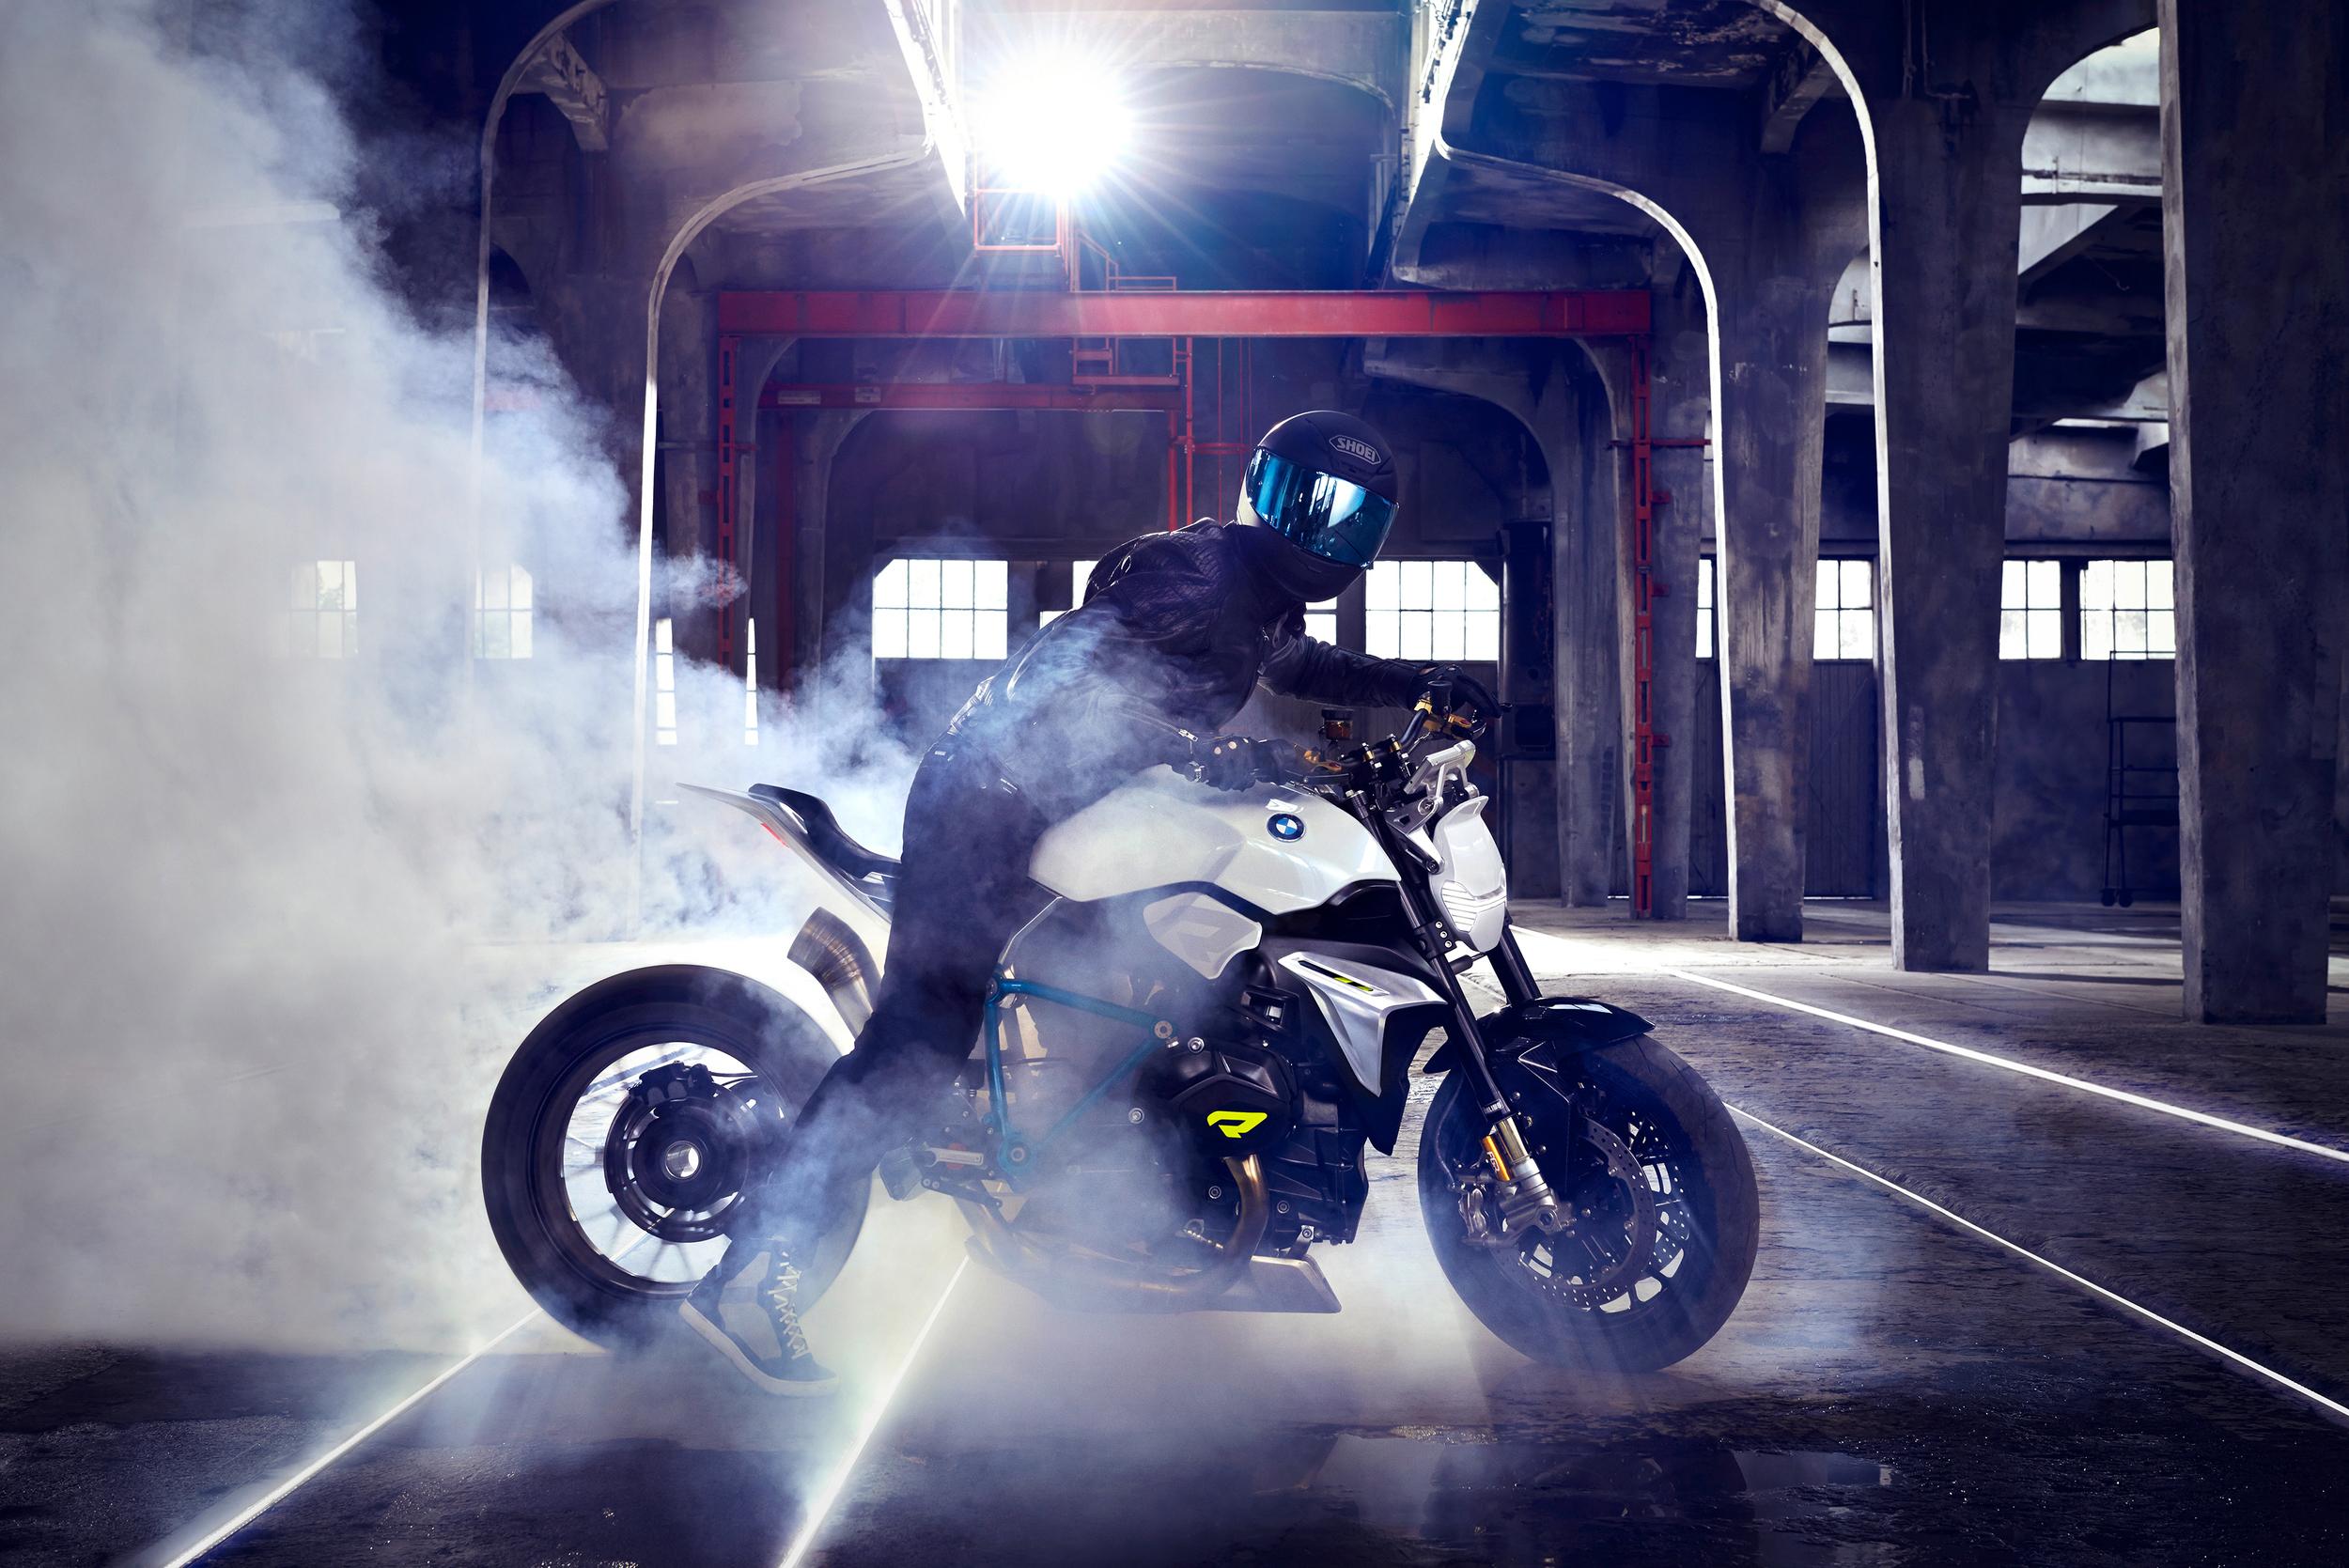 Bmw Concept Roadster Bike Drifting Hd Bikes 4k Wallpapers